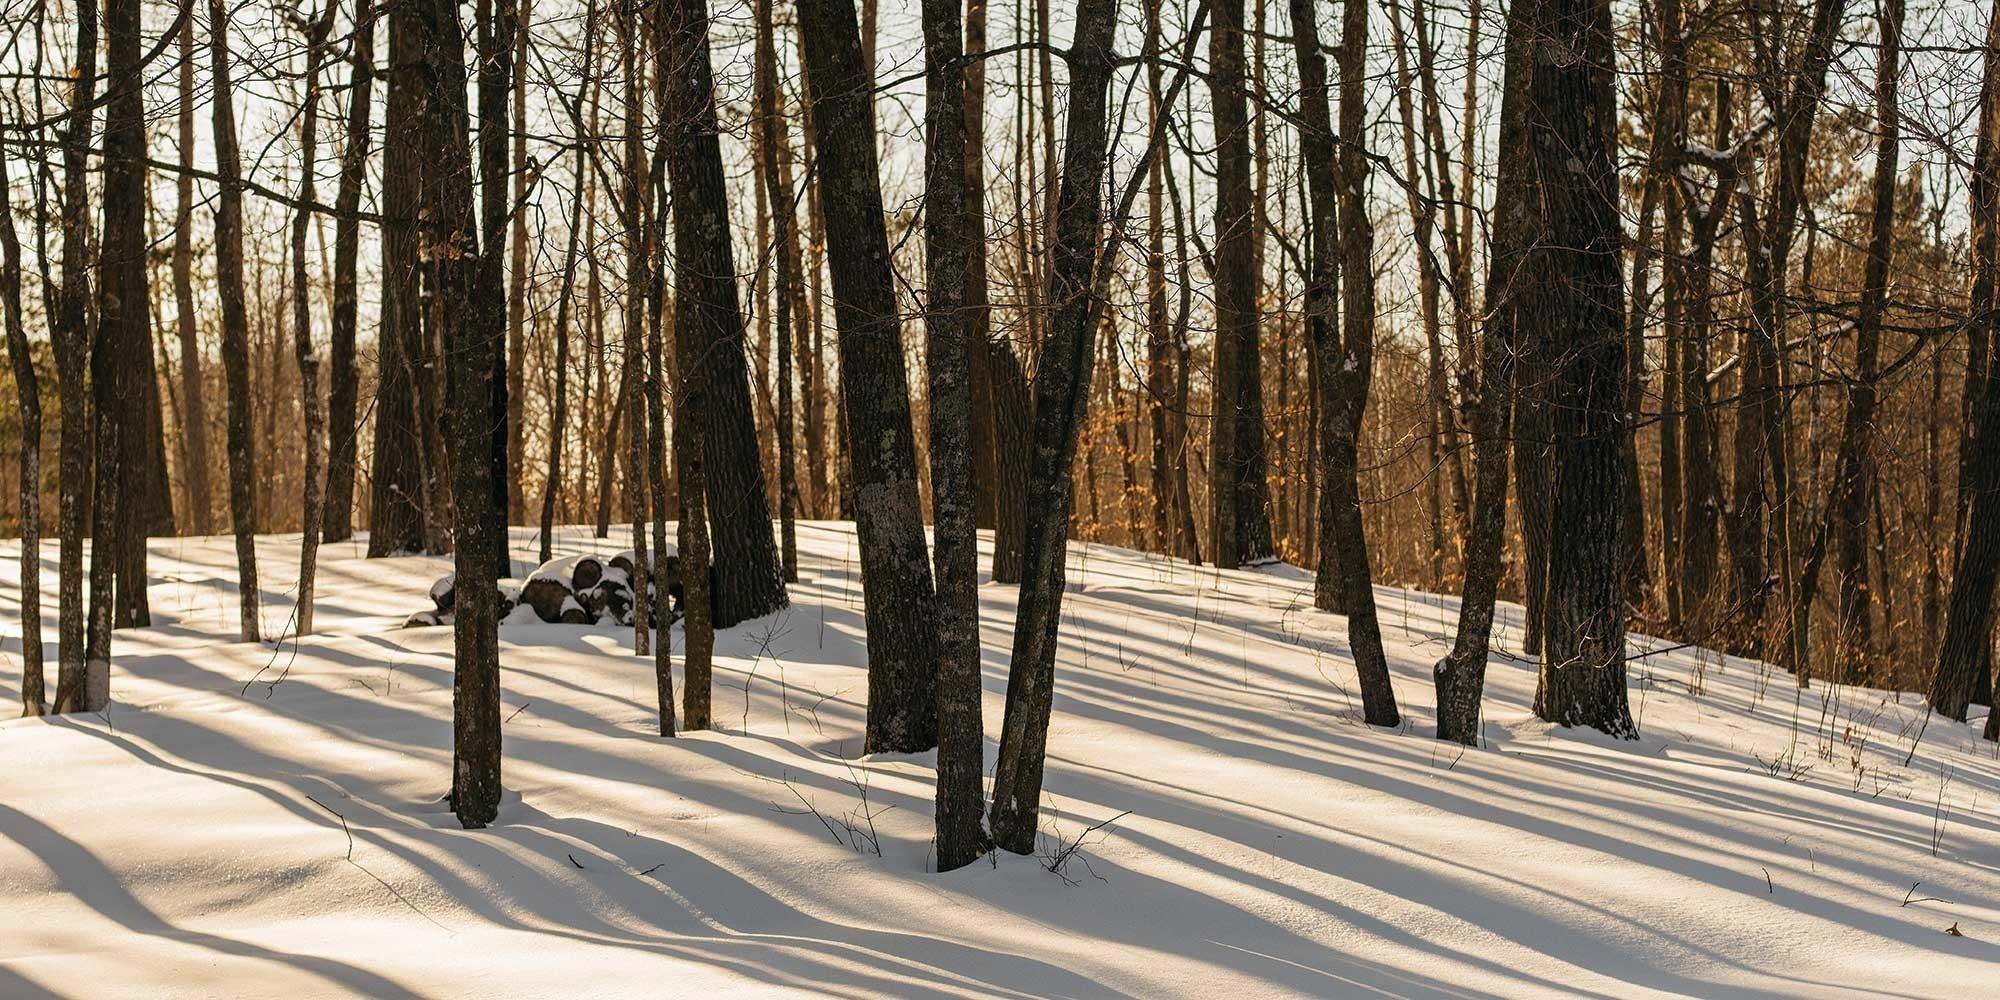 northern-minnesota-2000x900.jpg